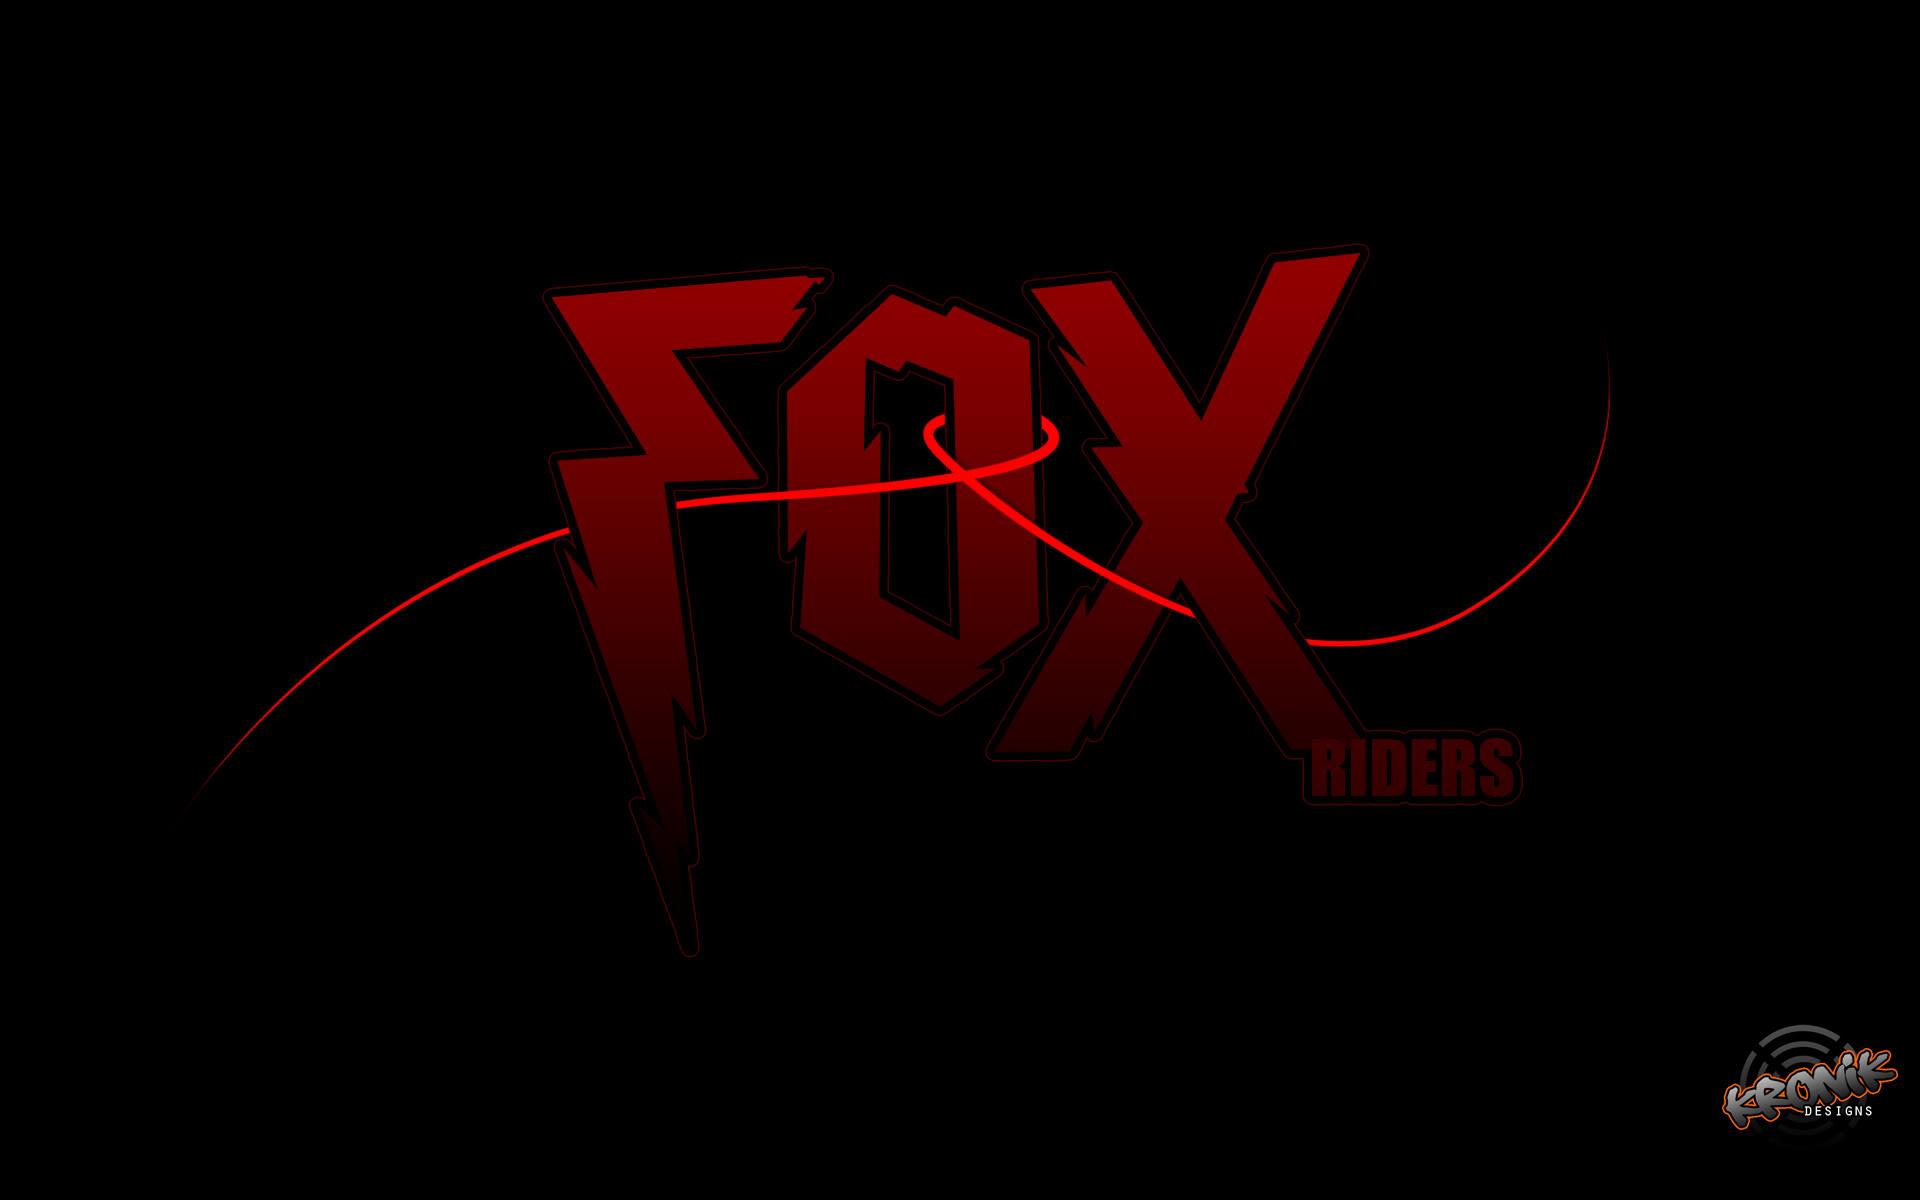 Fox Racing Motocross id 192707 1920x1200